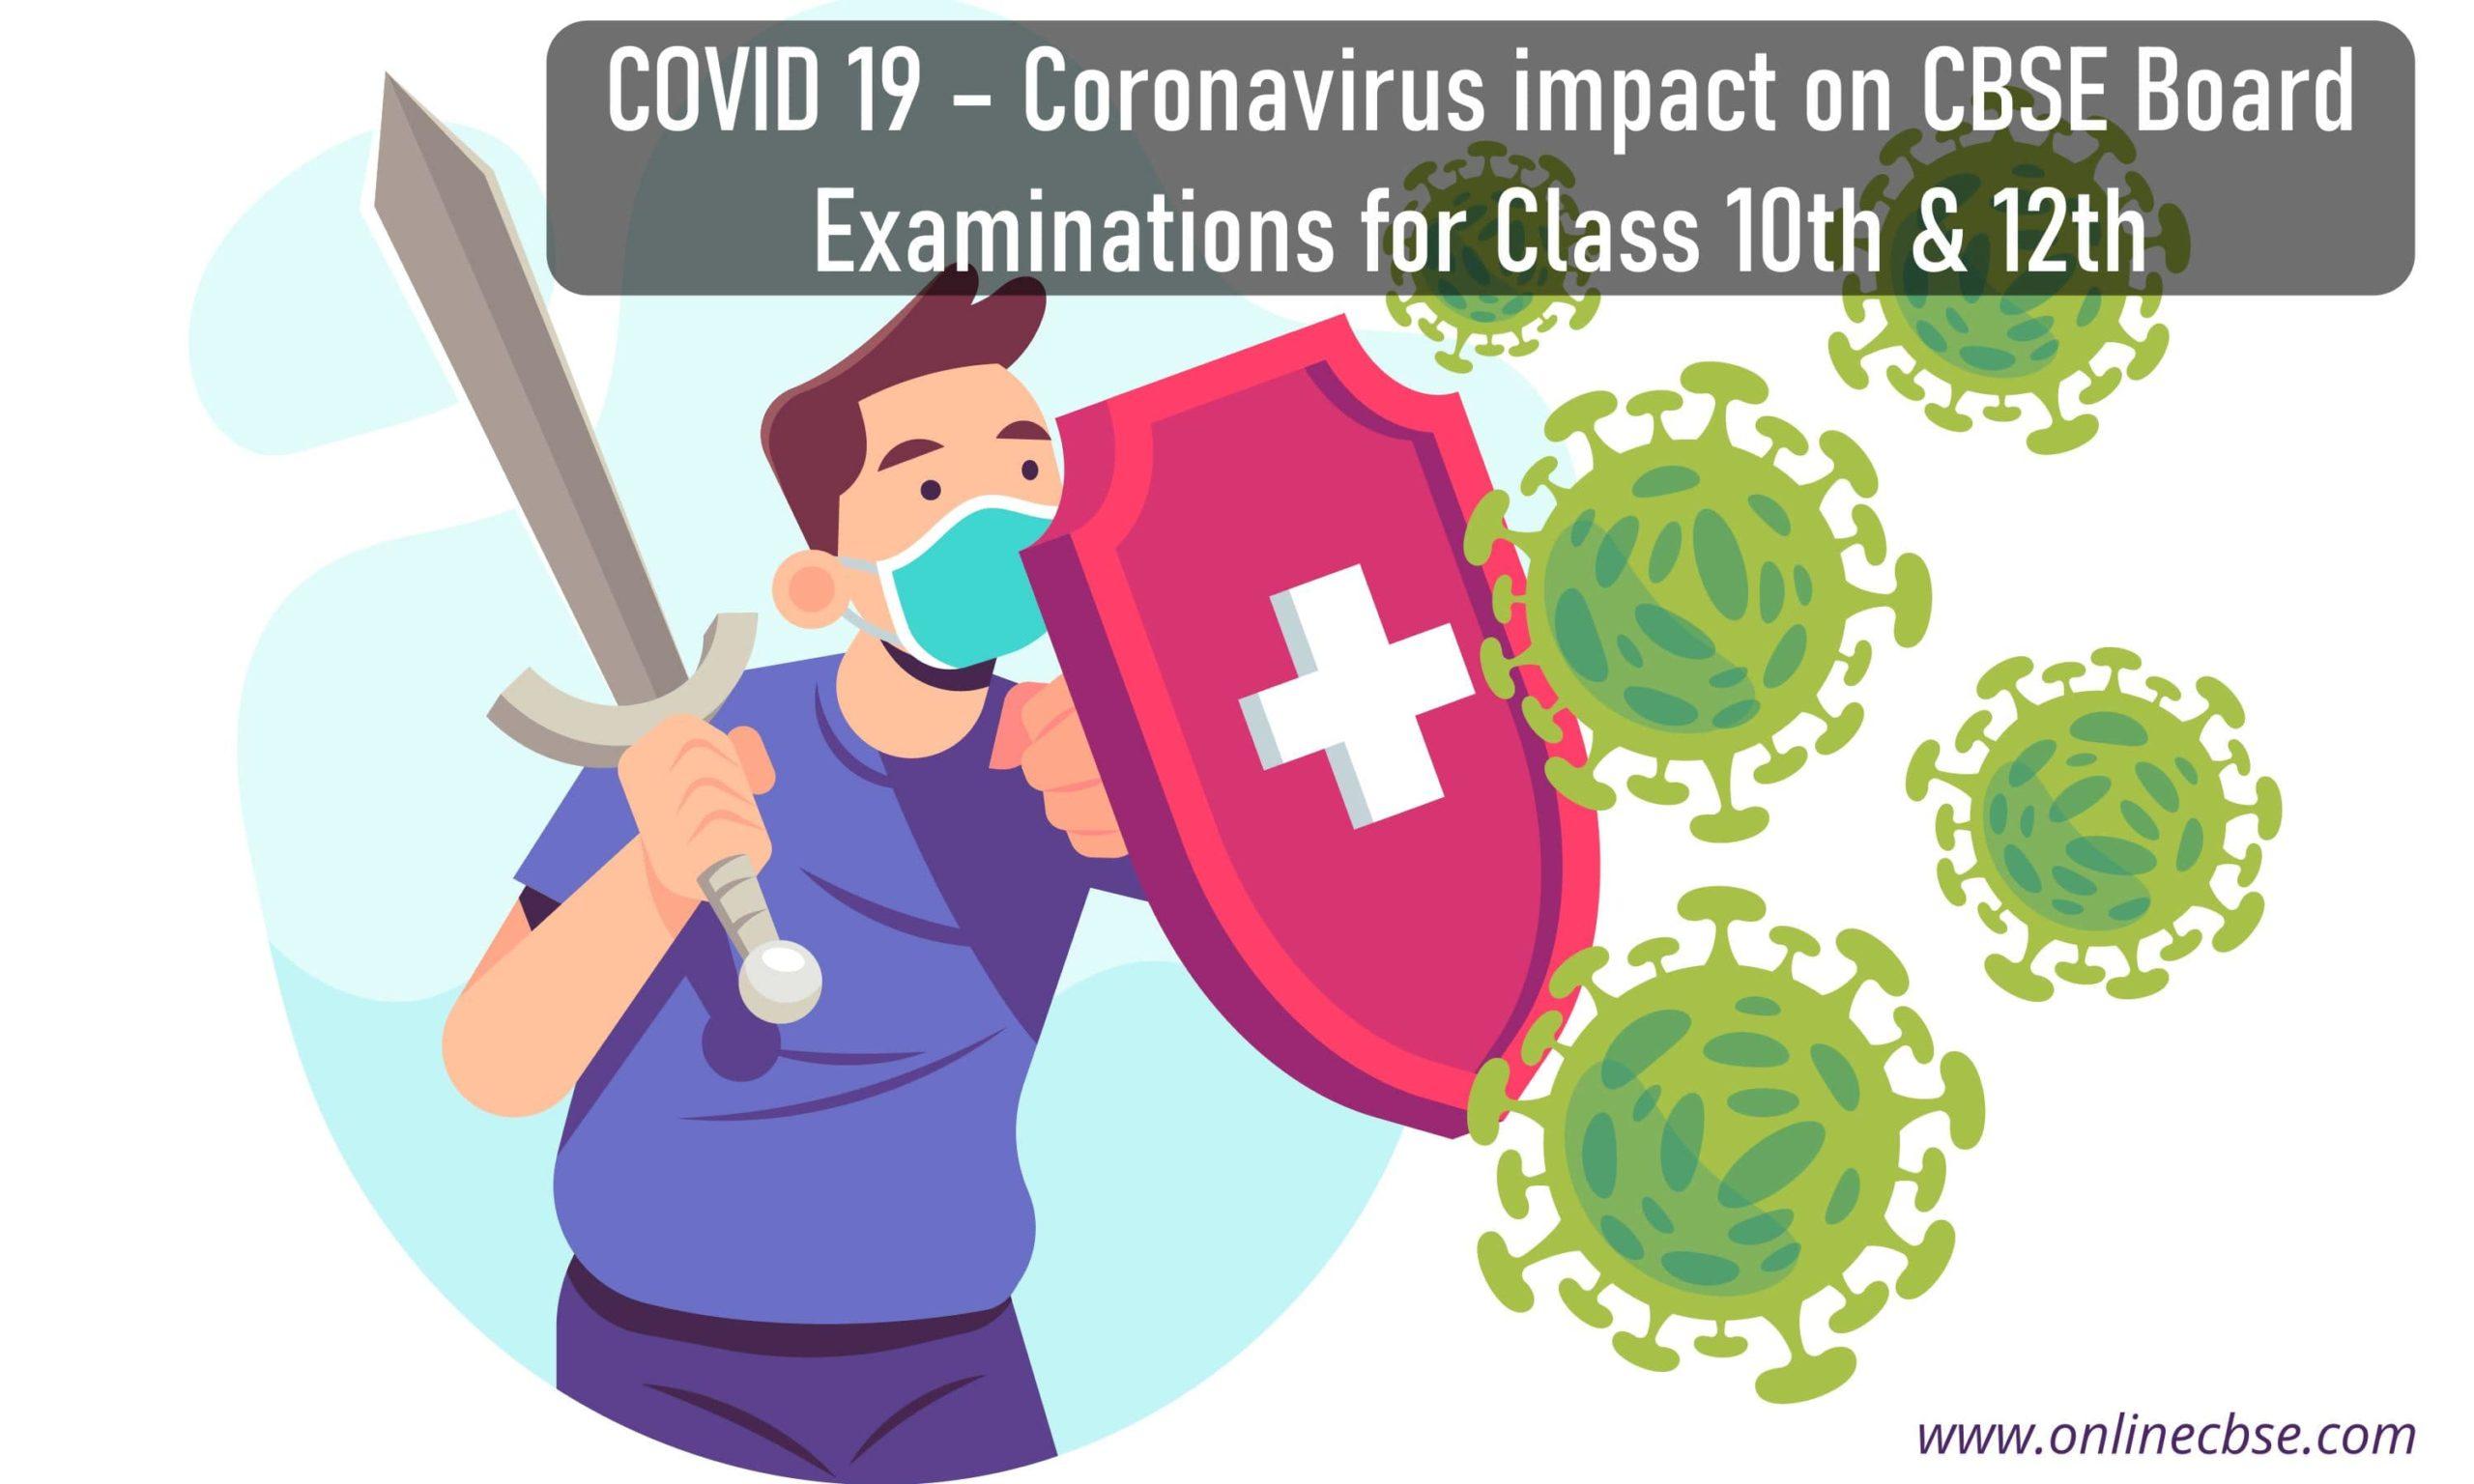 Coronavirus impact on CBSE Board Examinations for Class 10th & 12th